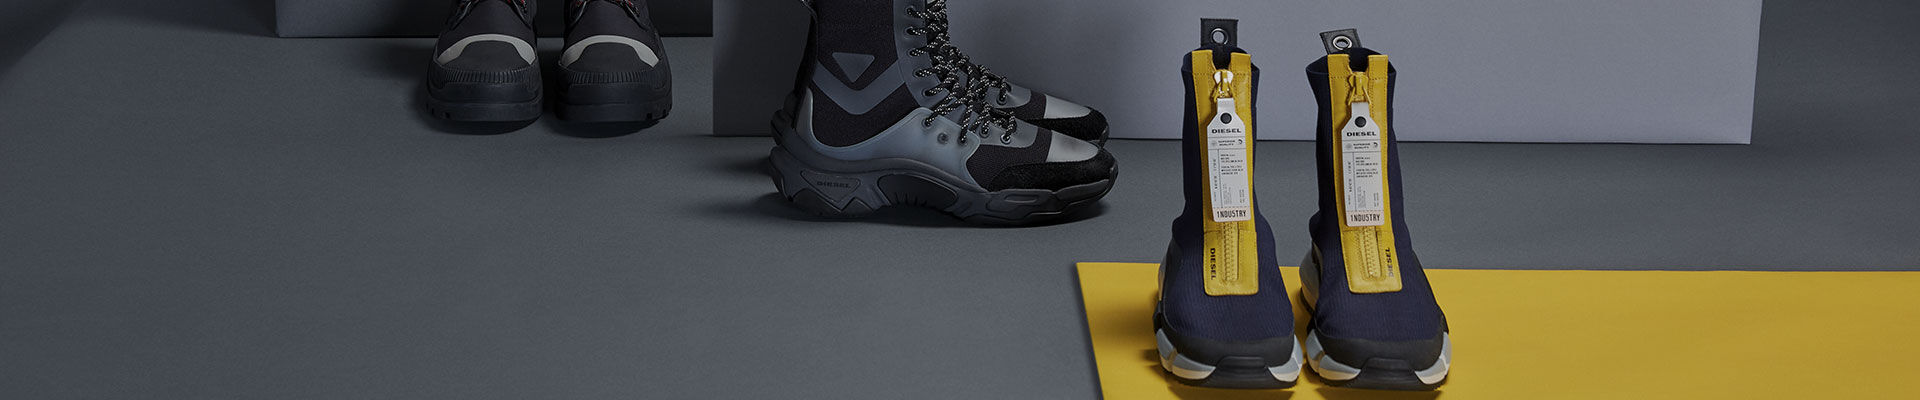 aff208ad8b549 scarpe diesel Online   Fino a 48% OFF Scontate